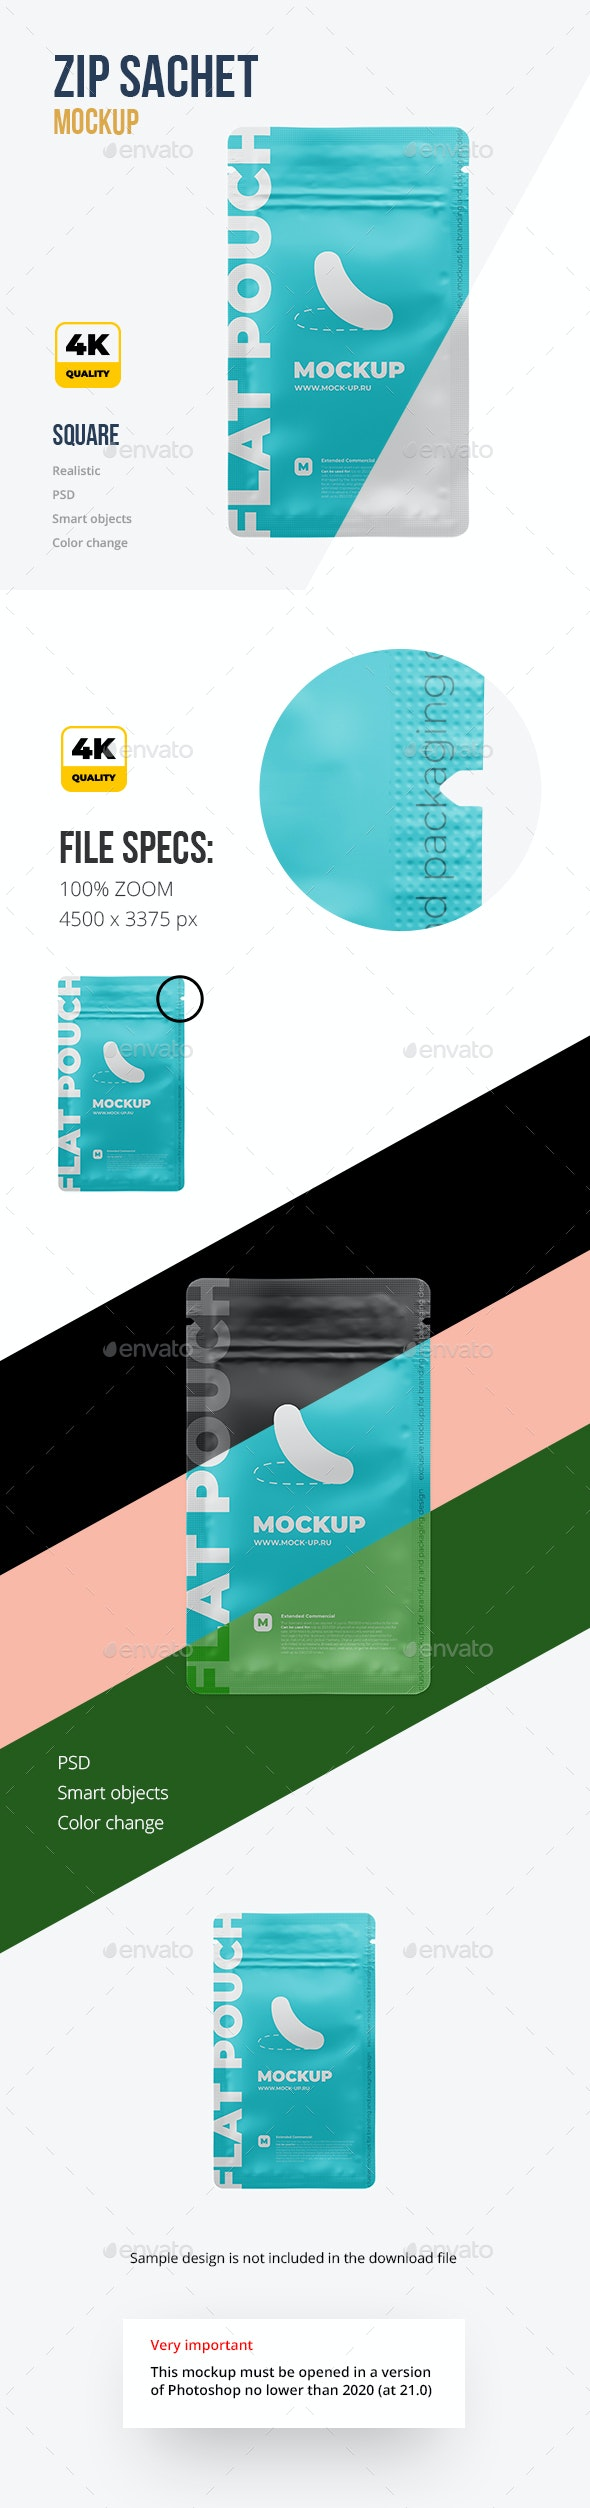 Flat Zip Sachet Mockup - Beauty Packaging